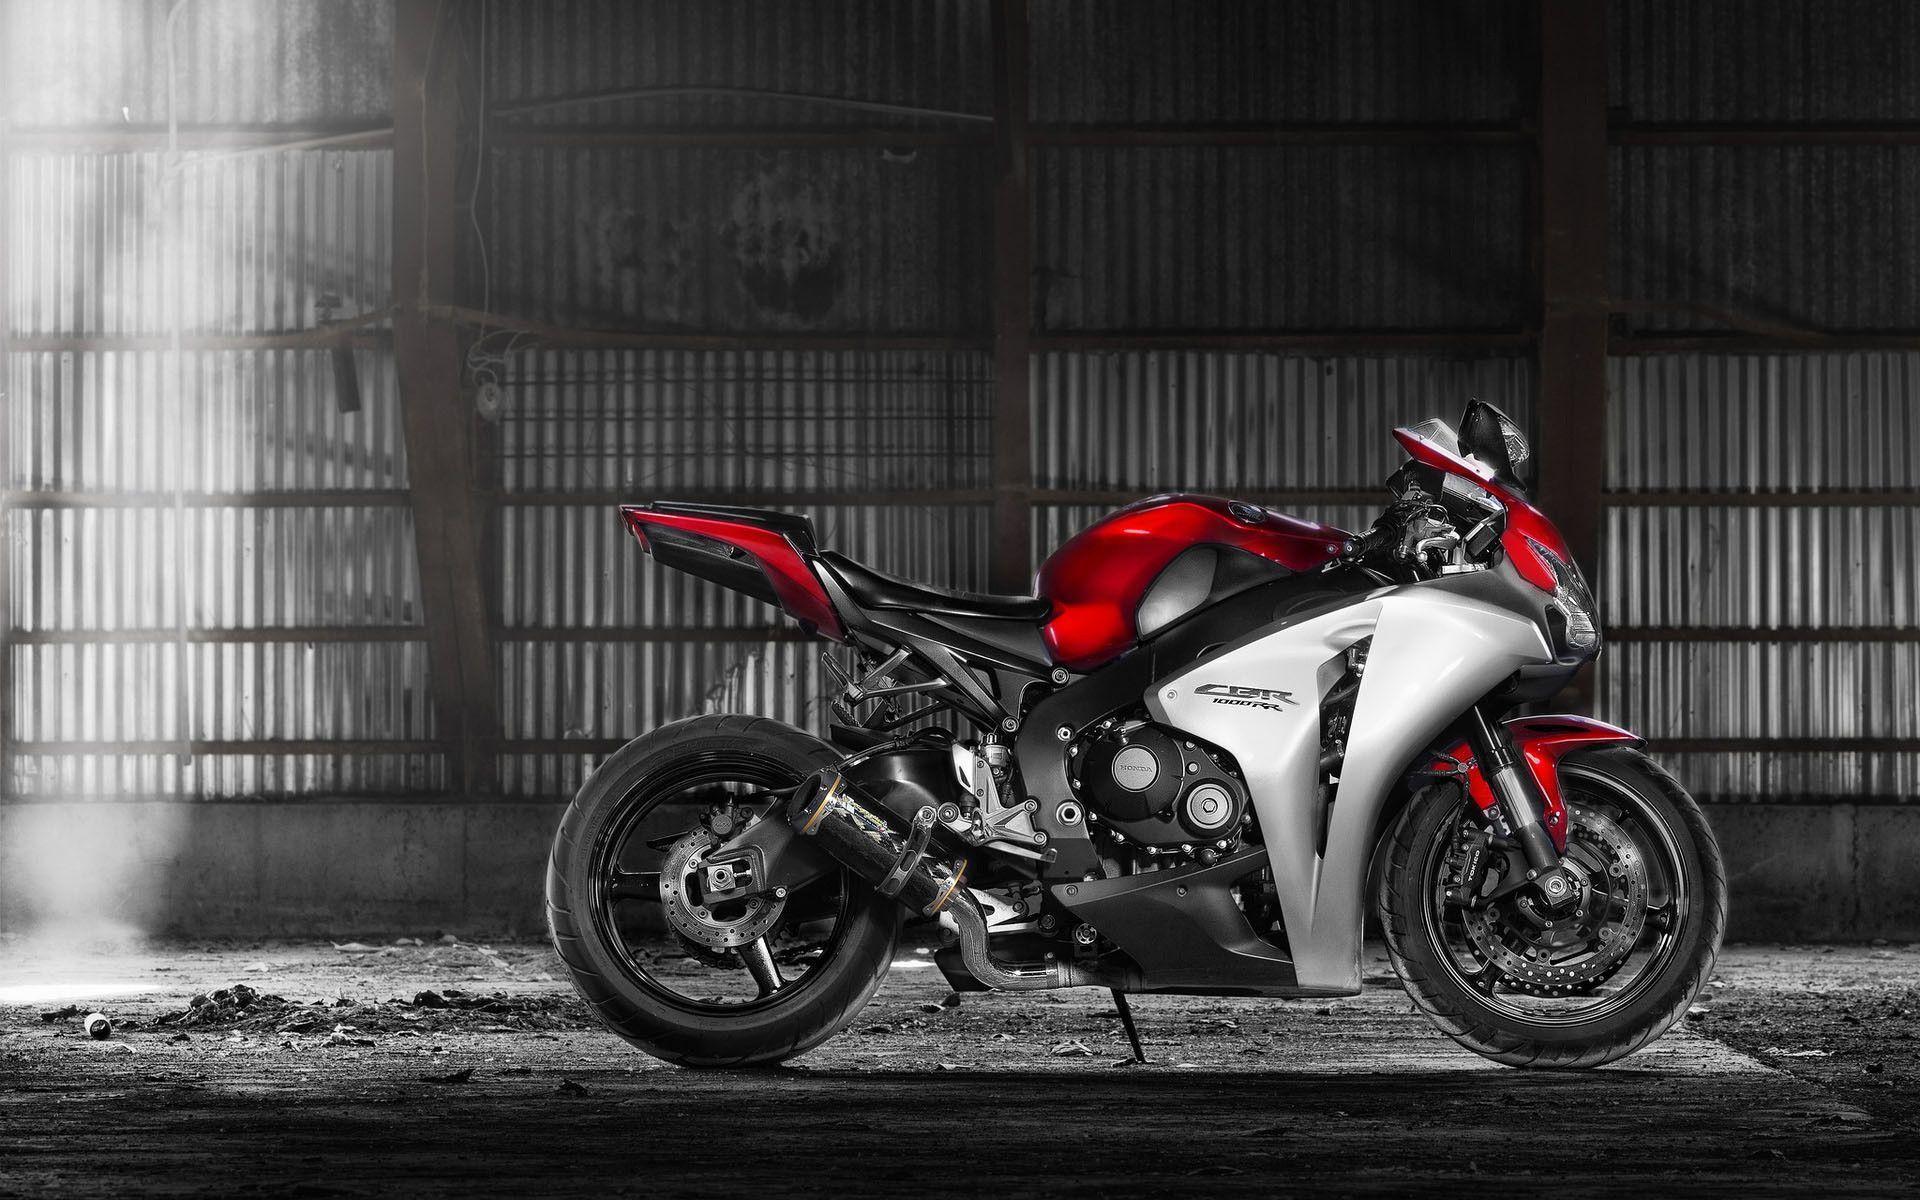 Honda CBR1000RR Wallpapers - Wallpaper CaveHonda Superbike 2013 Wallpaper